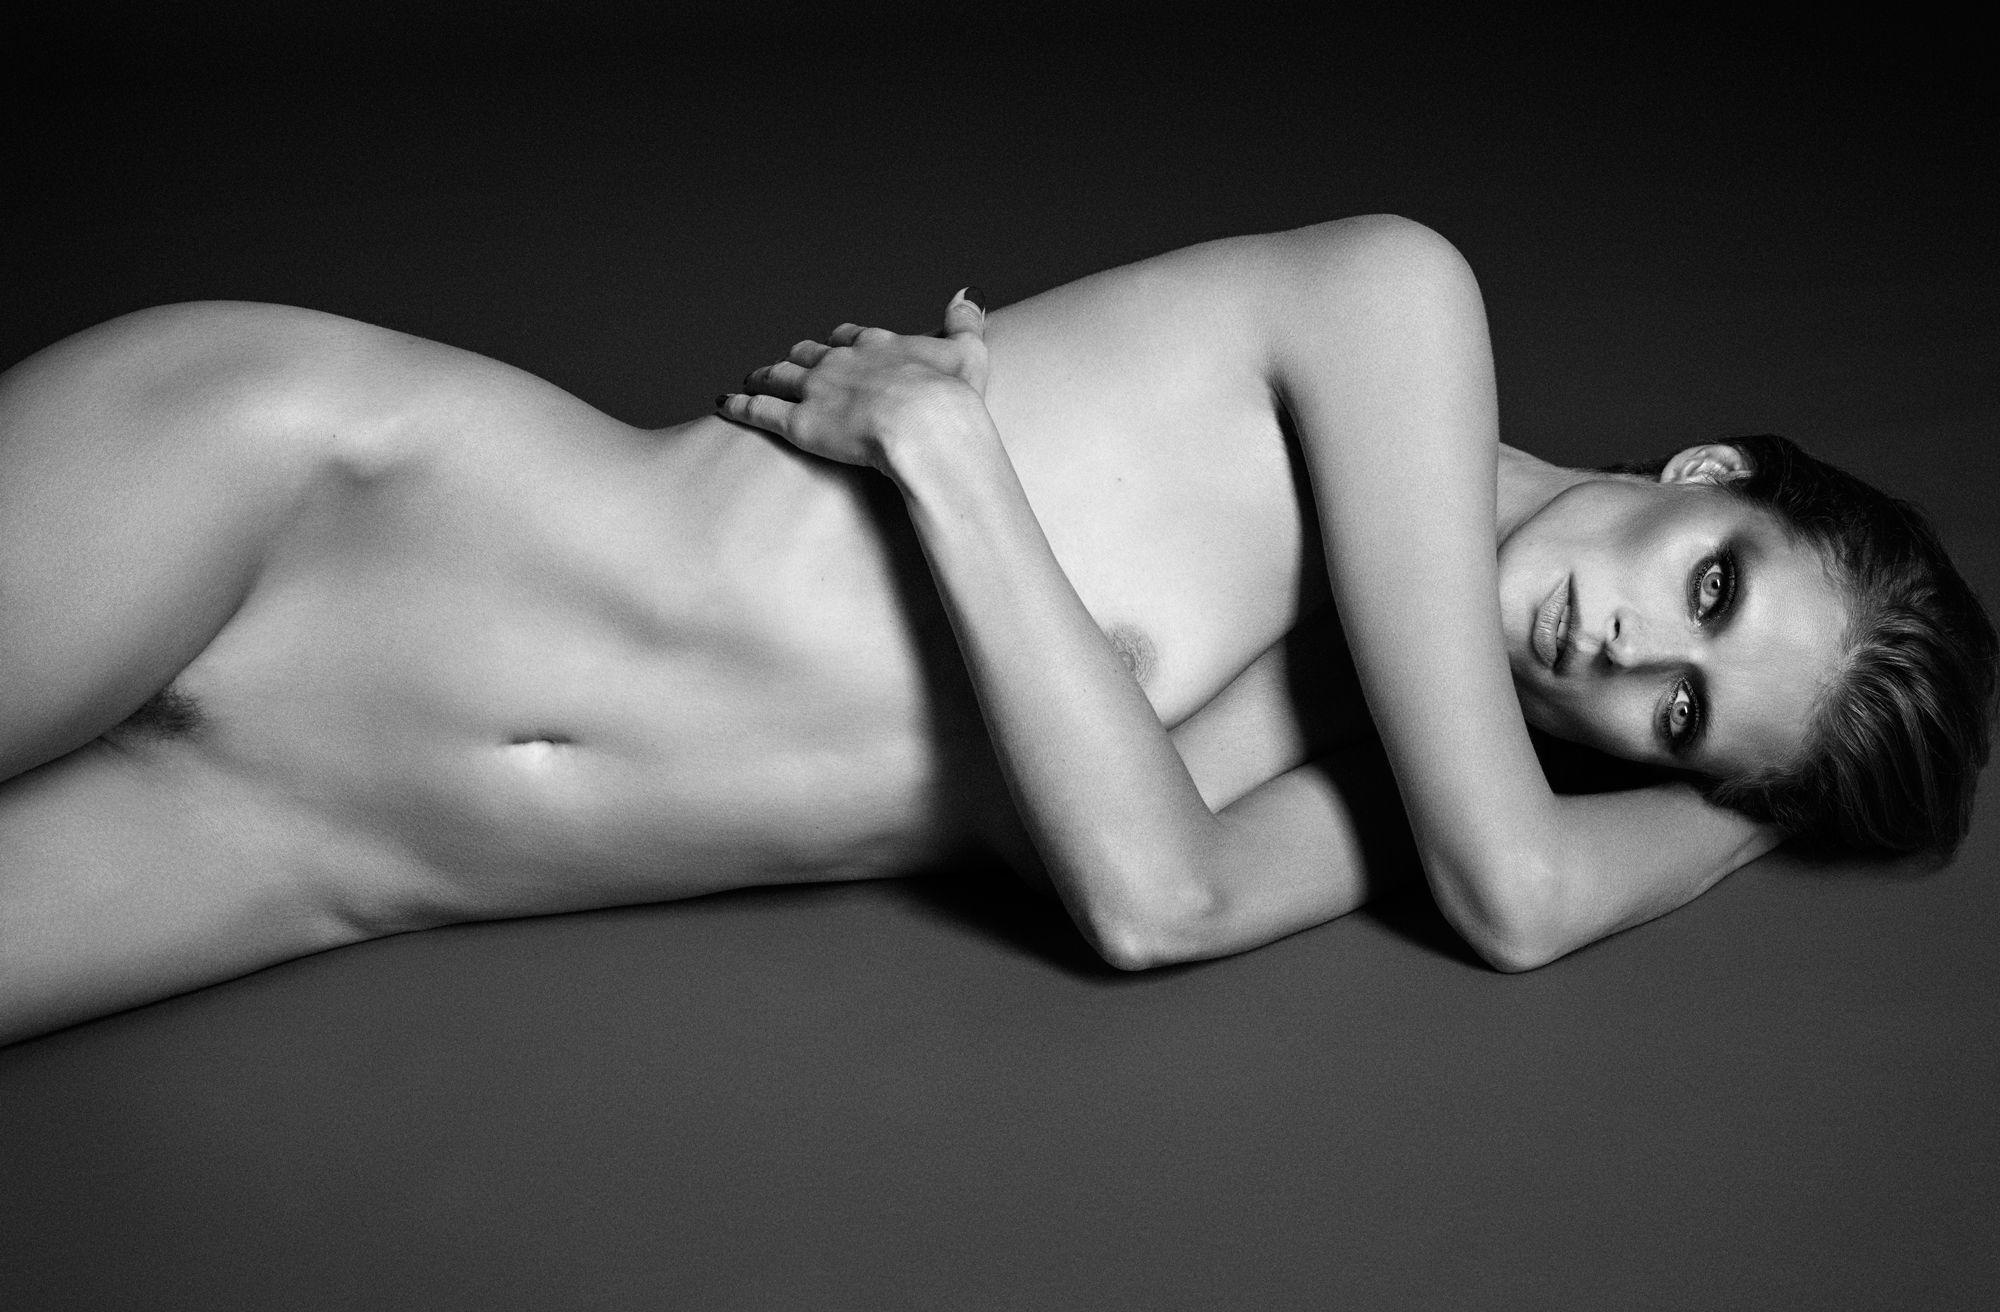 Sexy naked photo shoot million